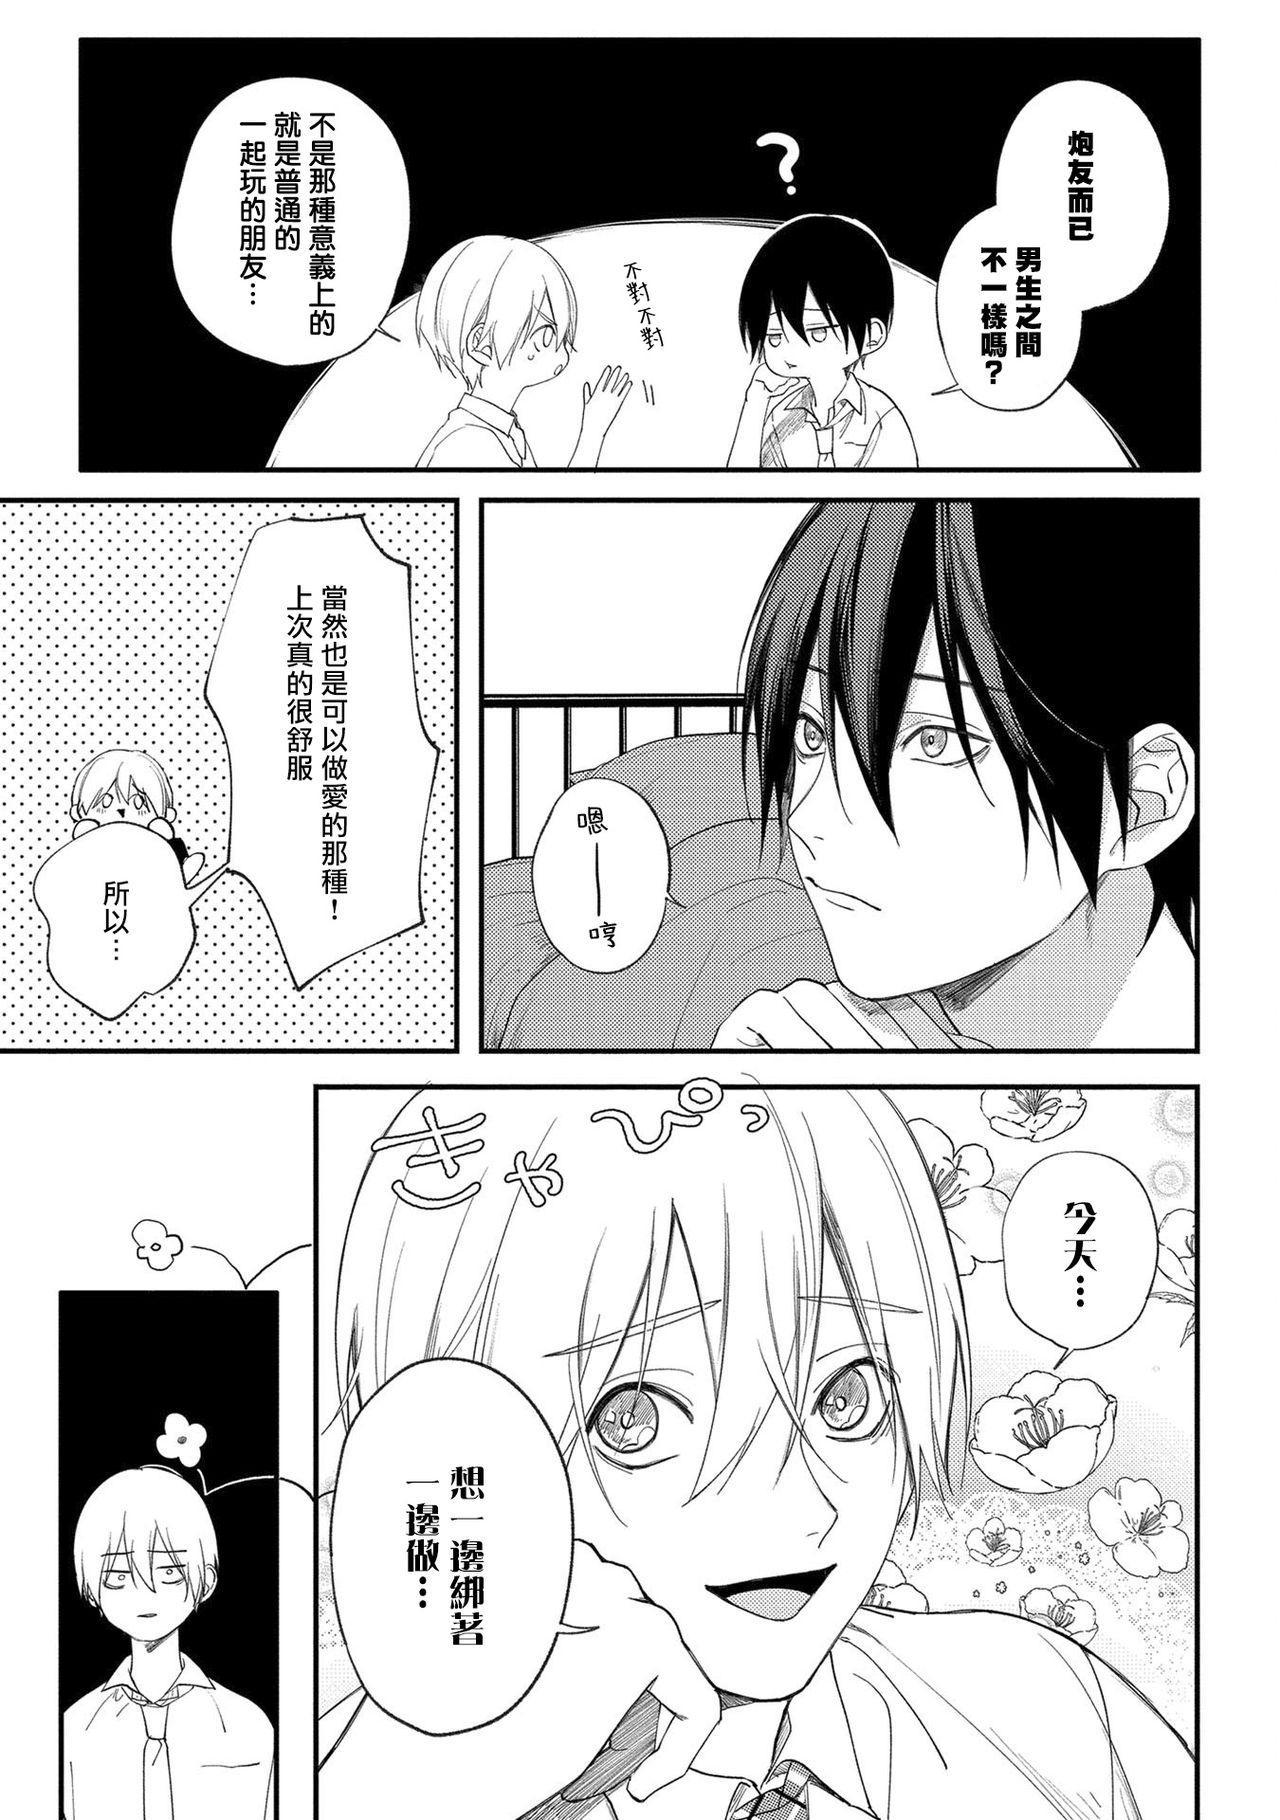 [Utata Hakuto] Houkago Virginity - Virginity afterschool 1-5 完结 [Chinese] [拾荒者汉化组] [Digital] 45